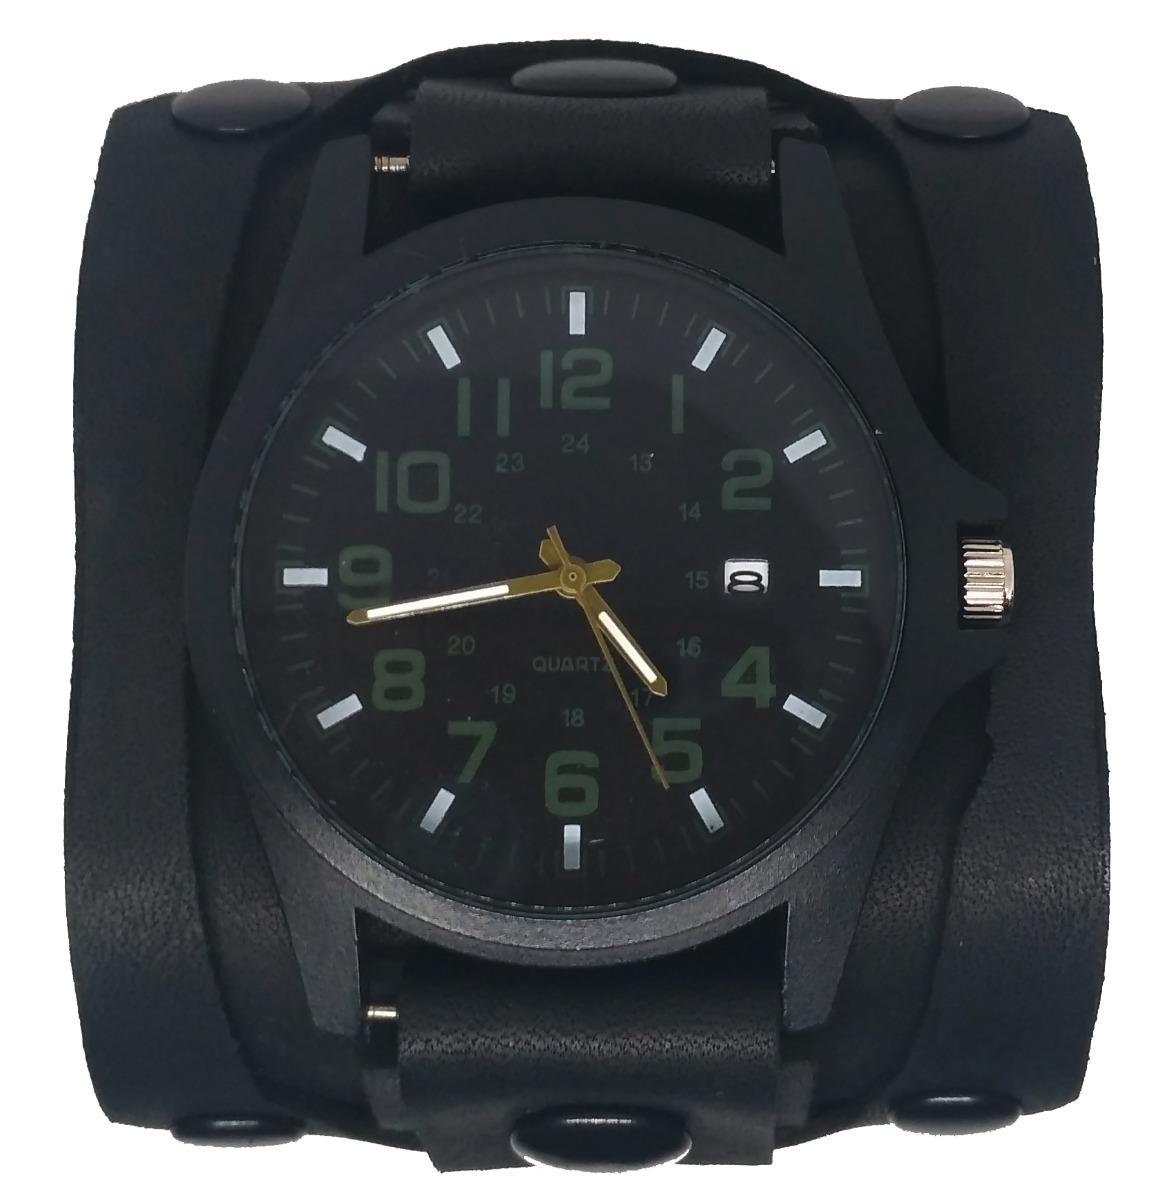 b24c50dd22aa muñequera brazalete pulsera de cuero con reloj rock. Cargando zoom.